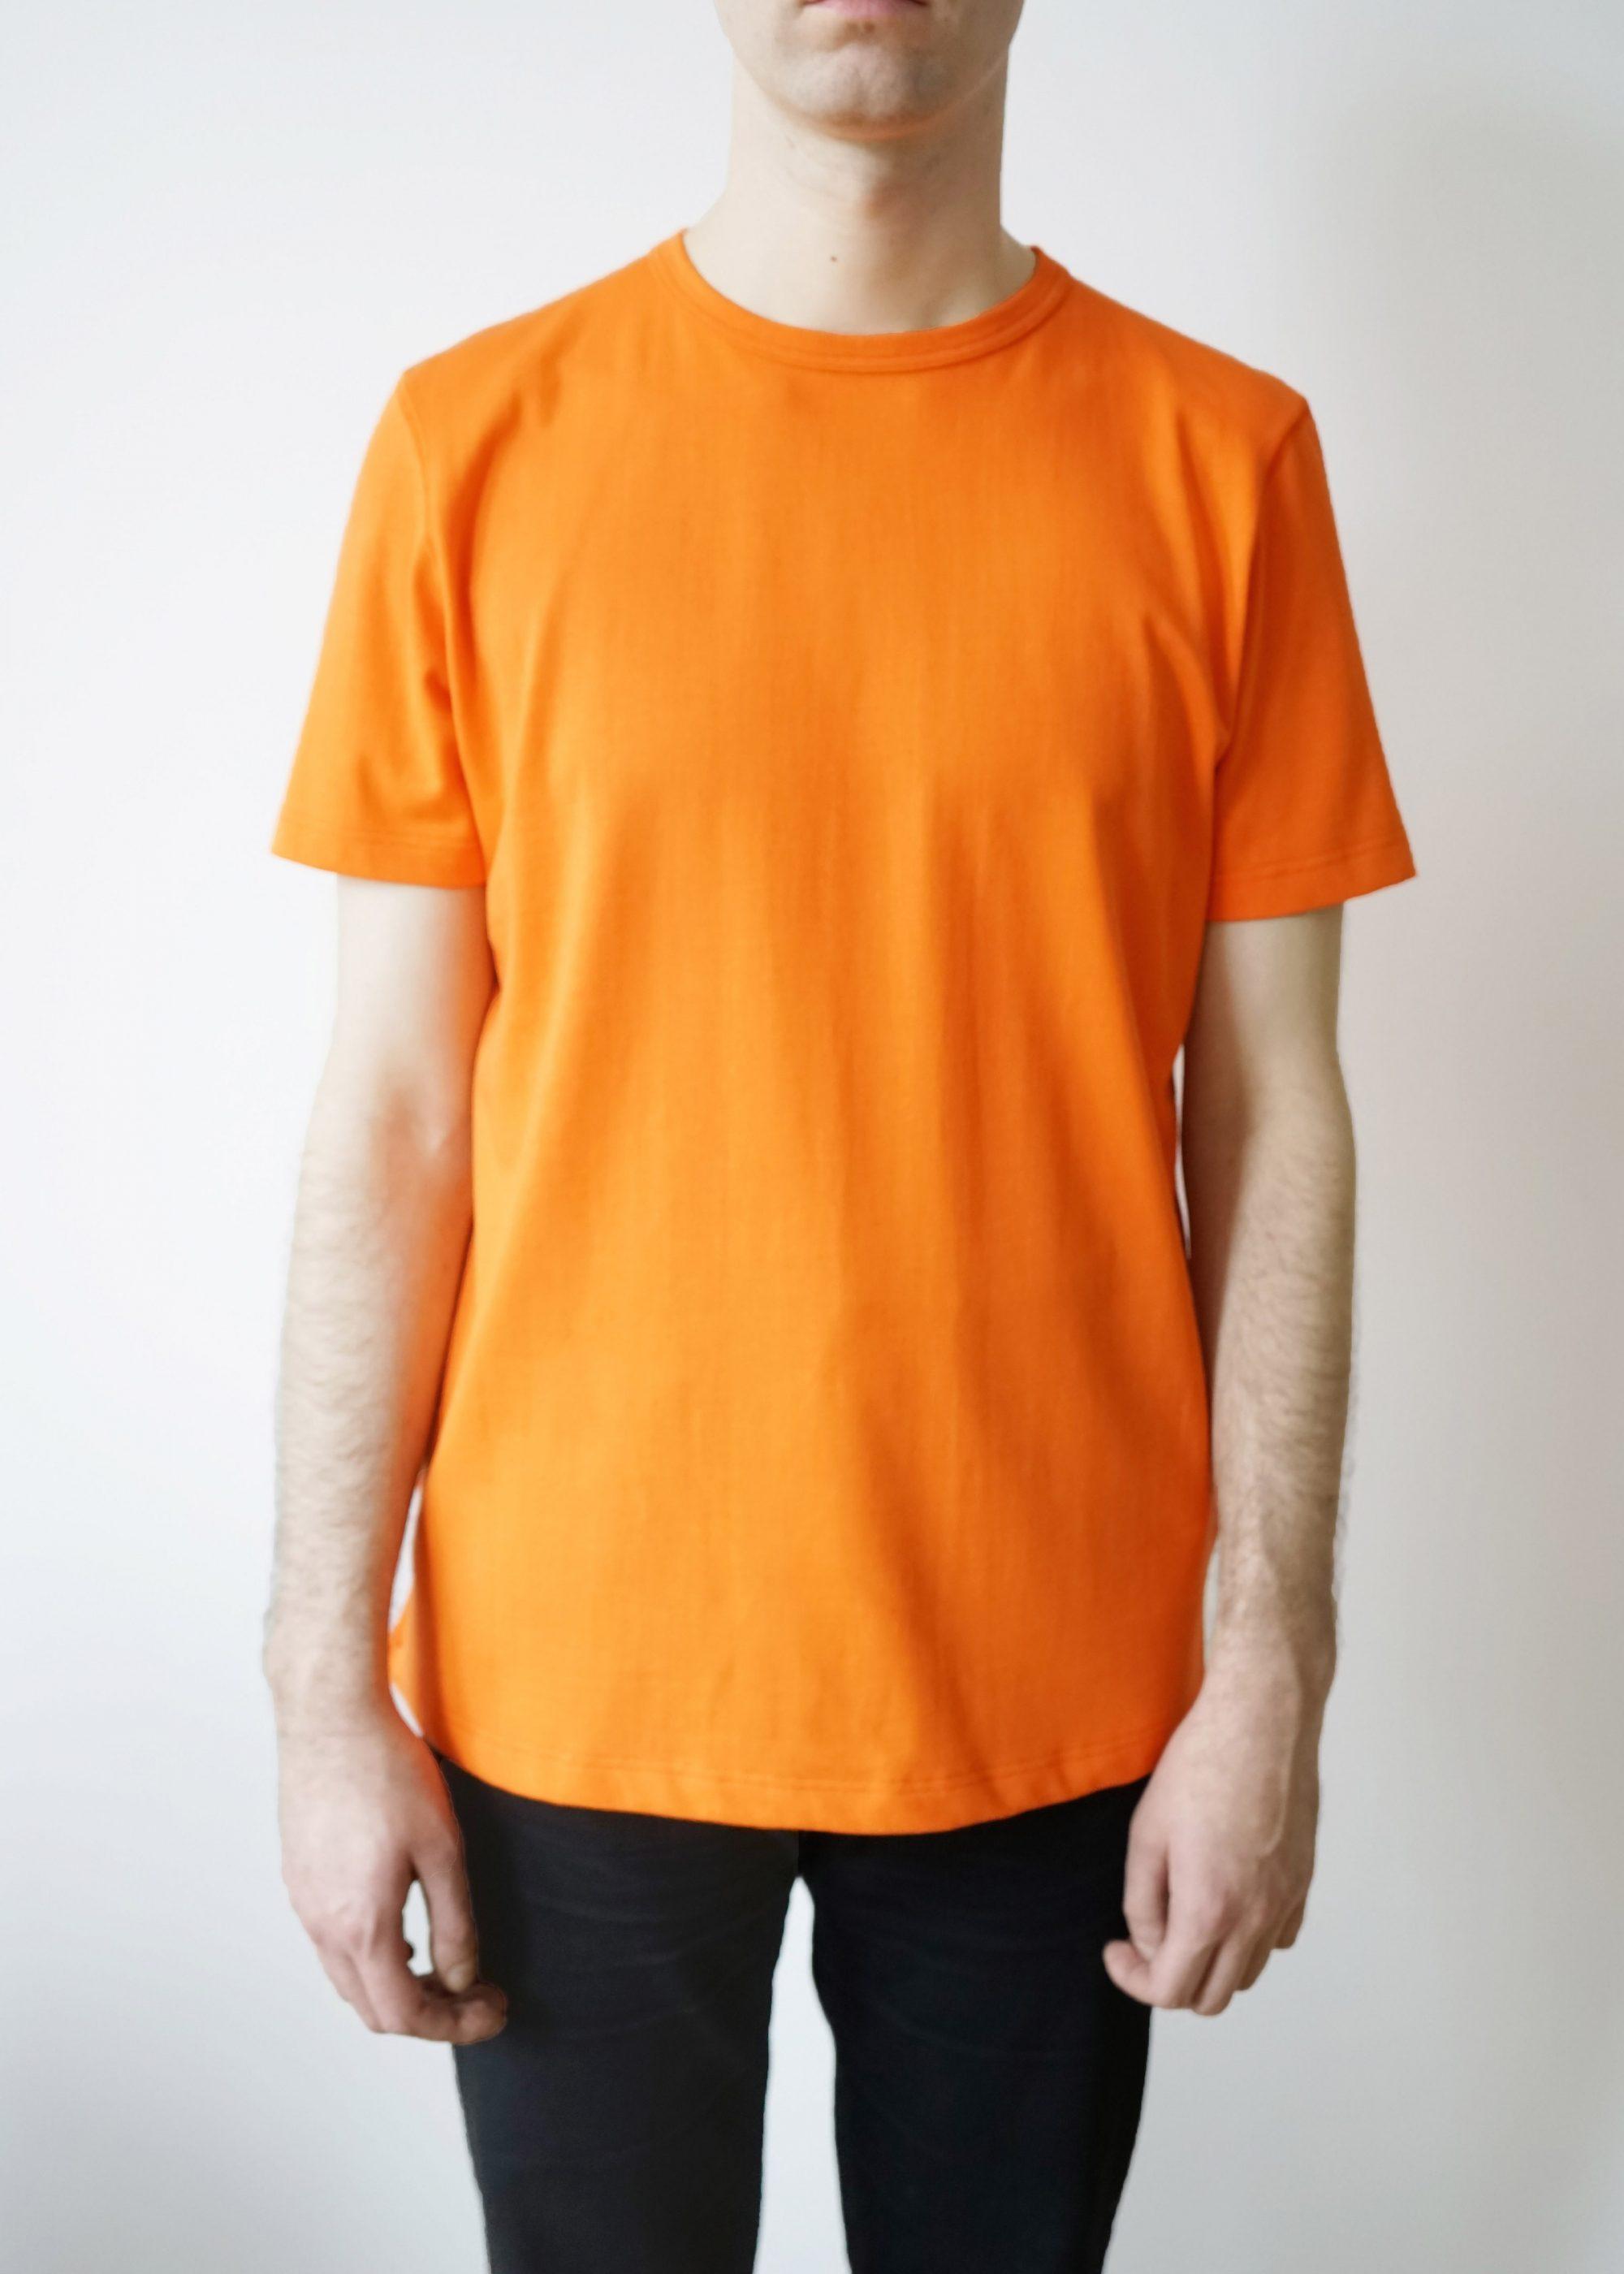 Product image for N° CJB3 Christo